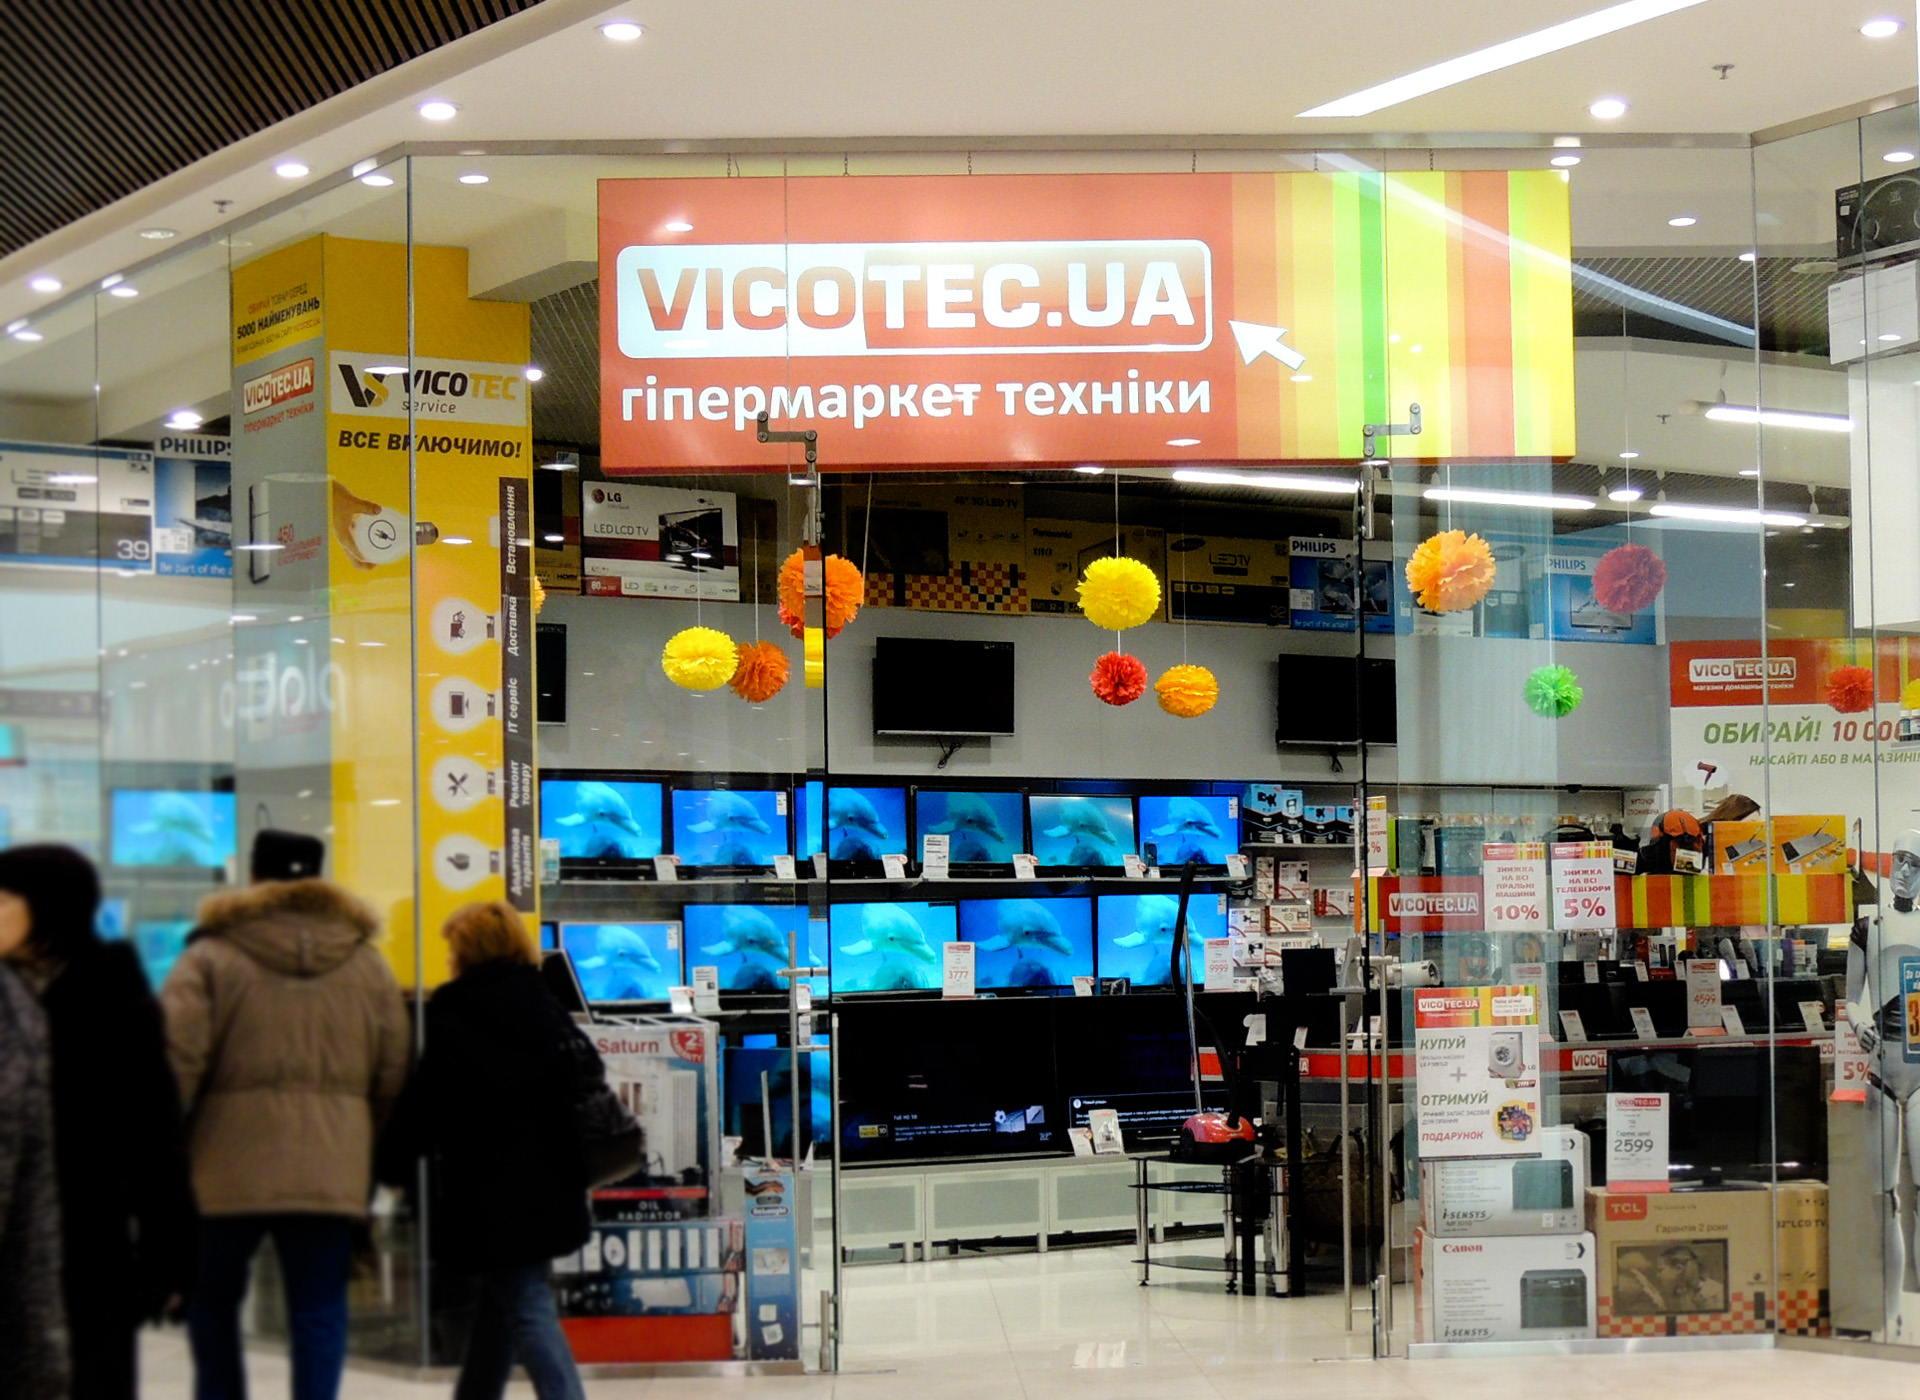 Vicotec гипермаркет техники дизайн фирменного стиля